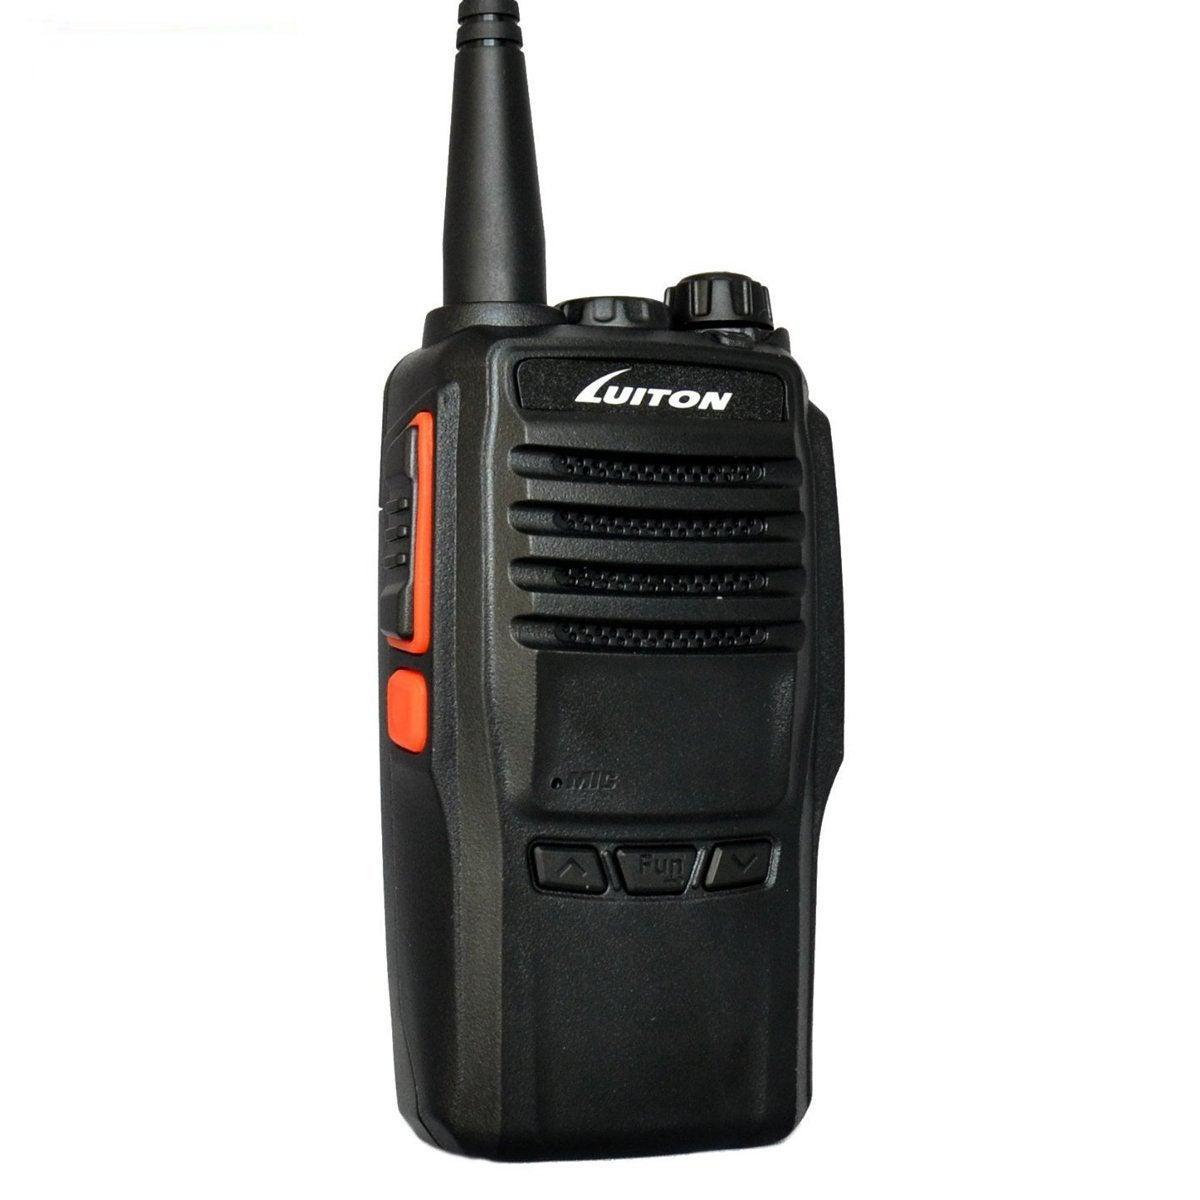 LUITON LT-188H VHF Walkie Talkie